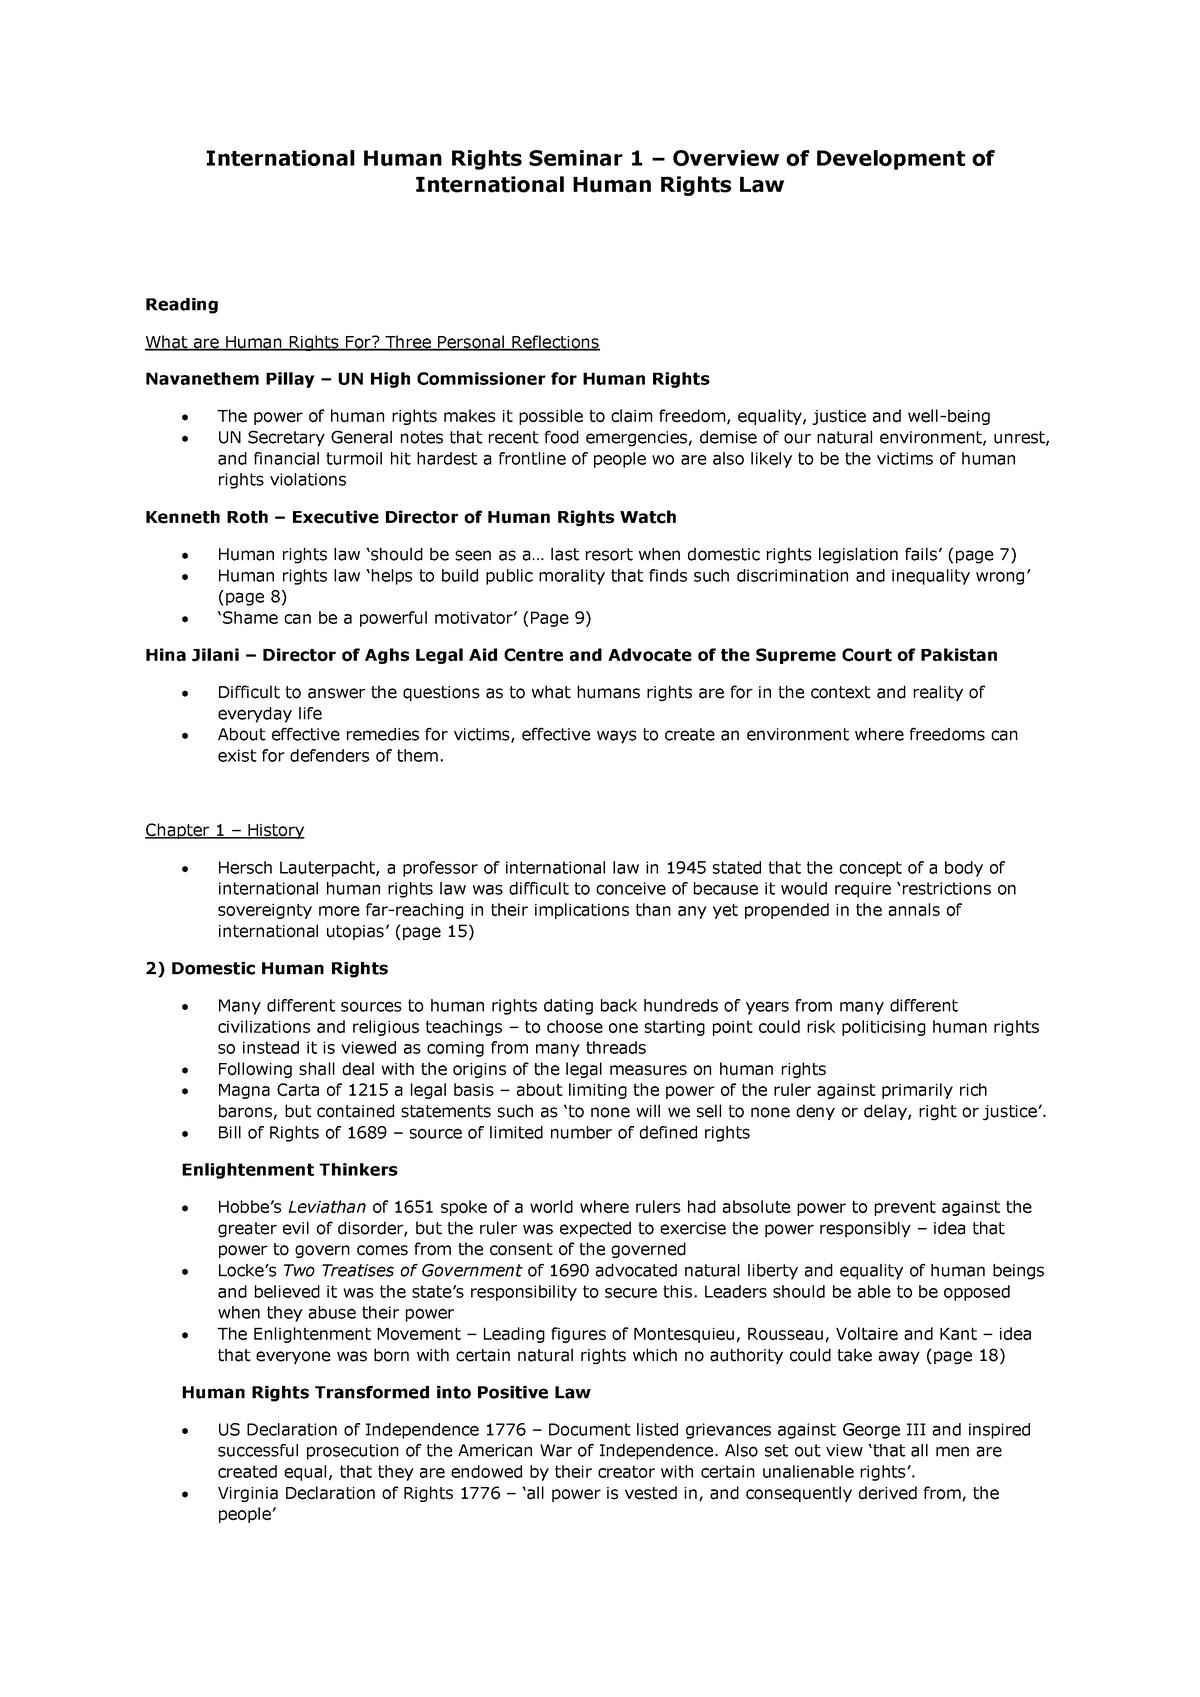 Summary International Human Rights Law - seminars 1-9